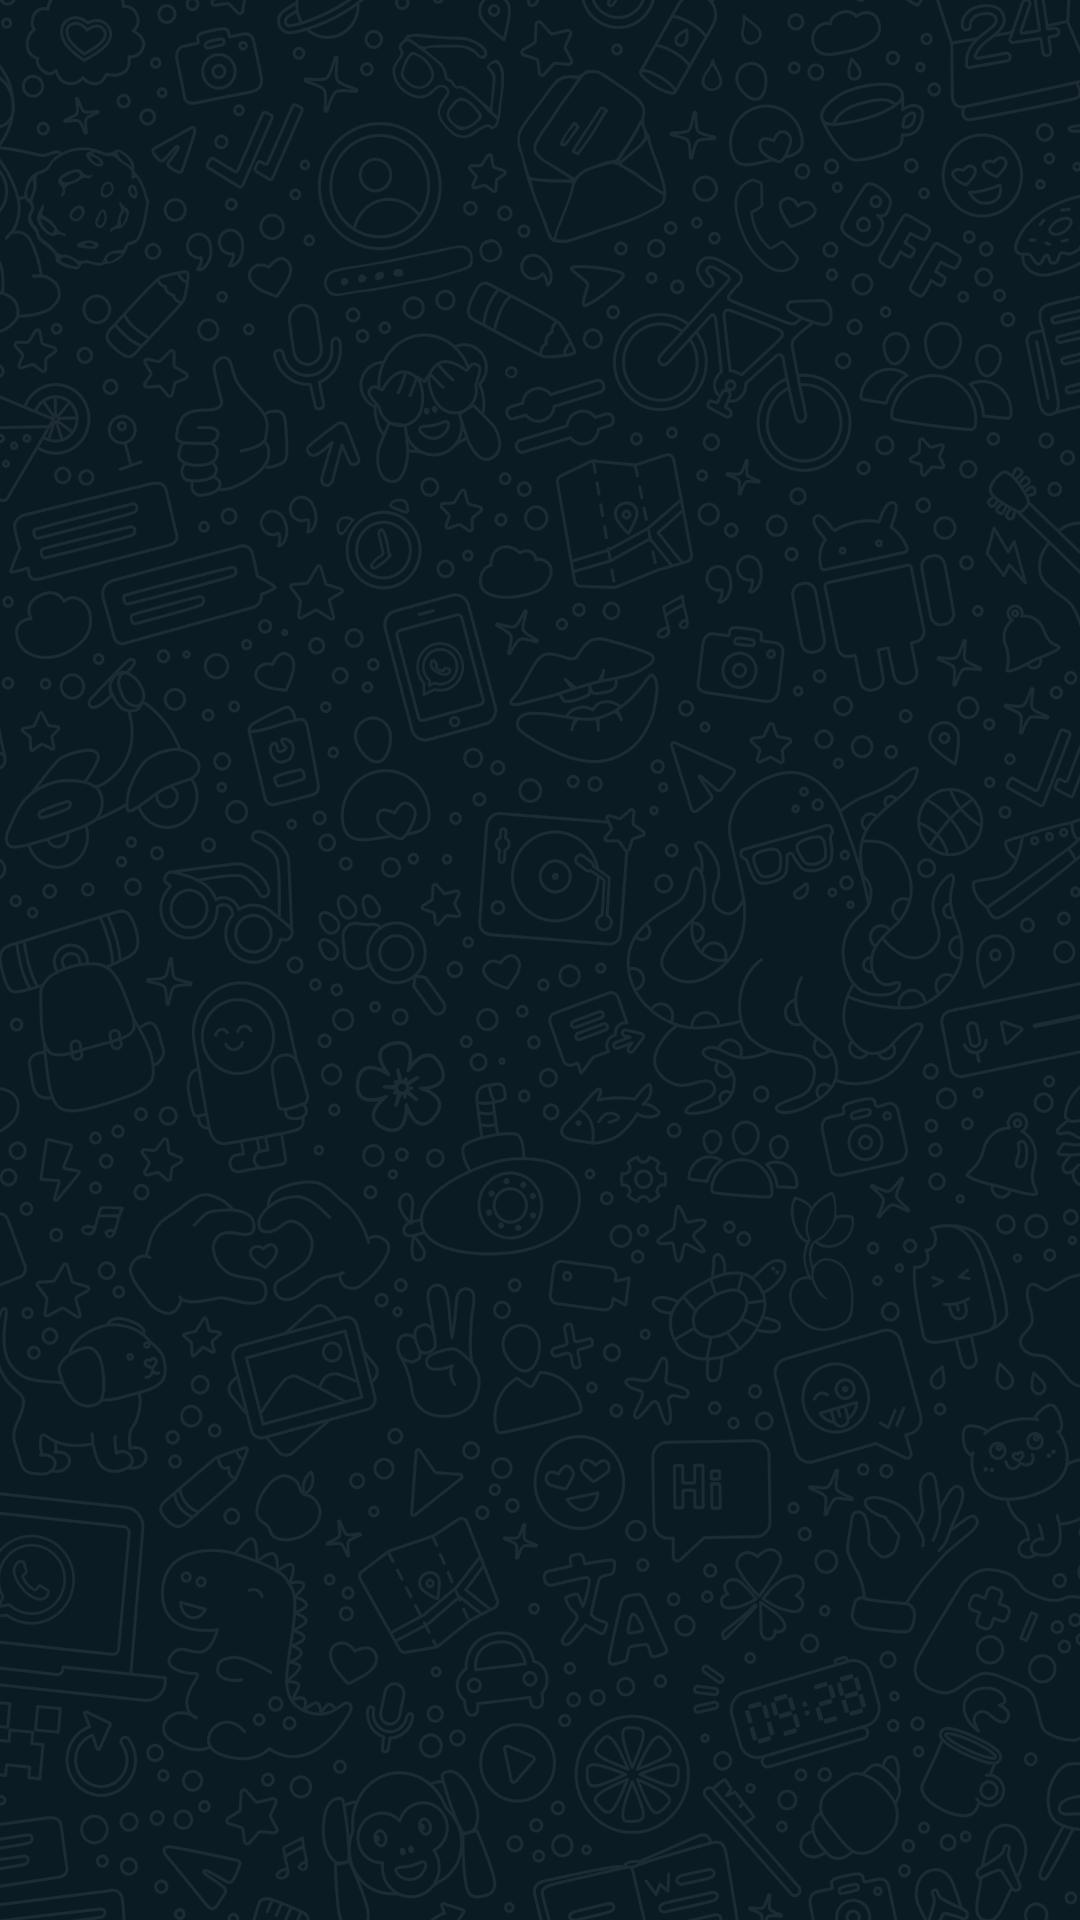 Default Whatsapp Dark Theme Wallpaper Chat Wallpaper Whatsapp Purple Wallpaper Iphone Iphone Wallpaper Moon